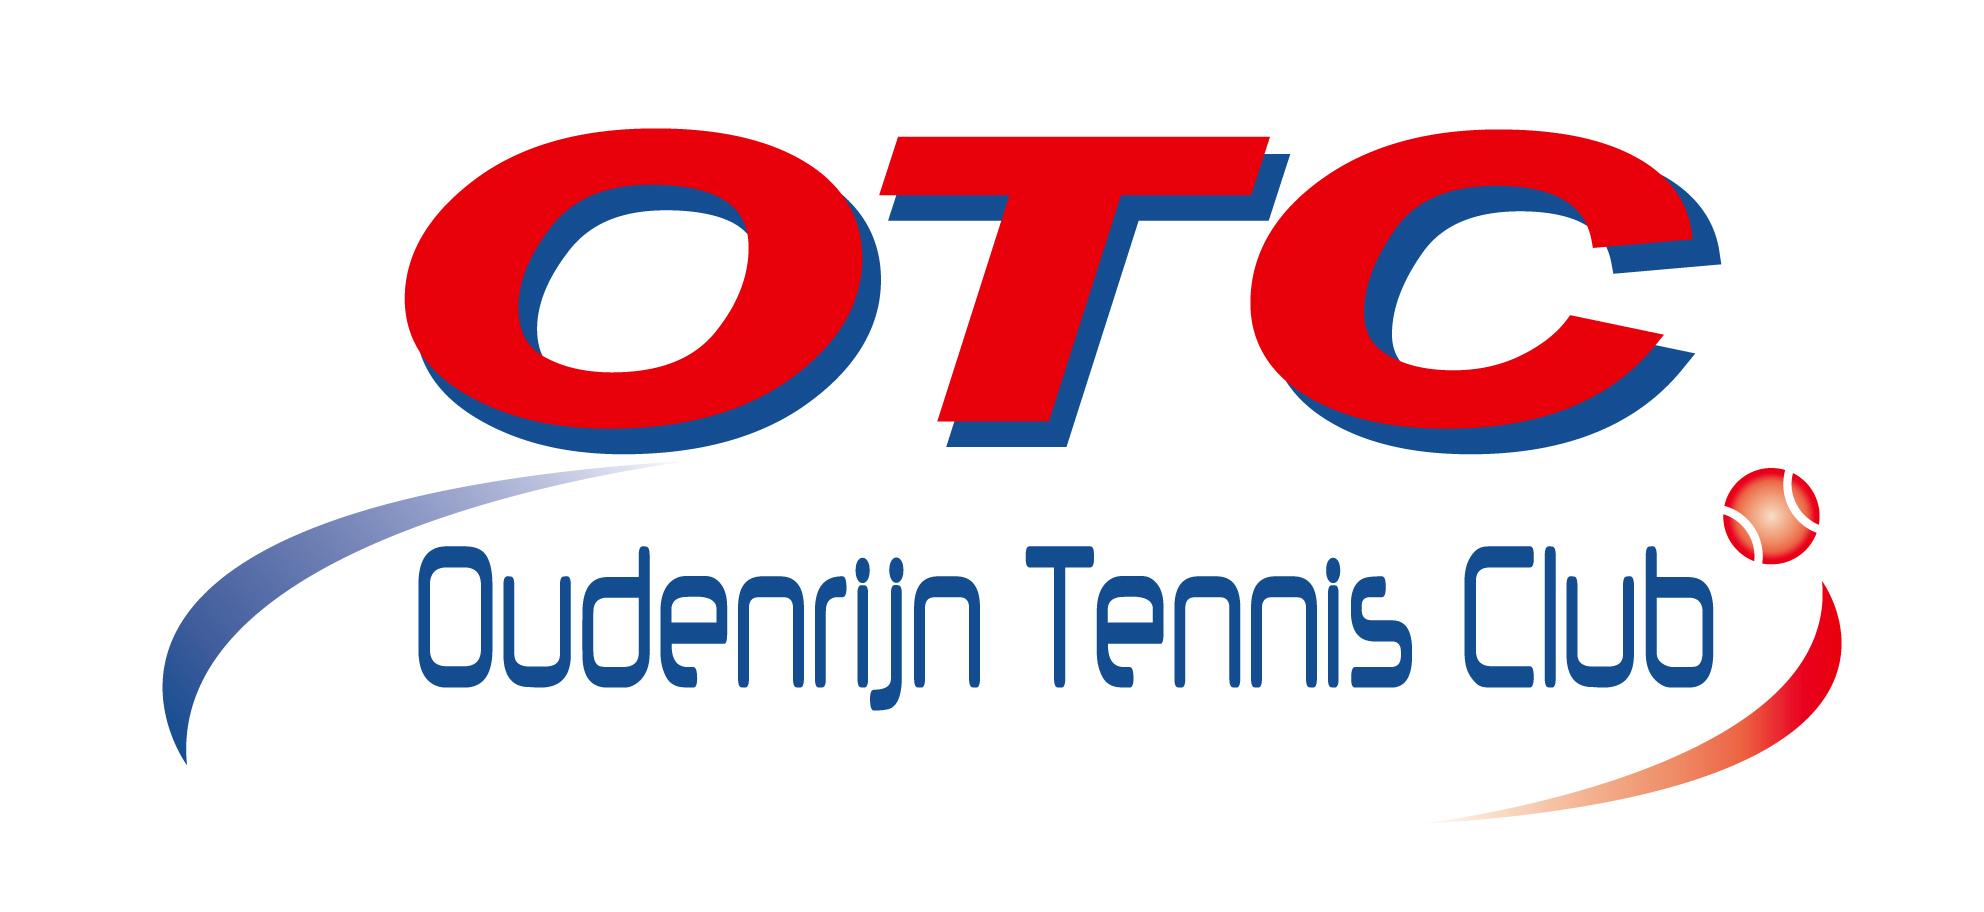 Oudenrijn Tennisclub